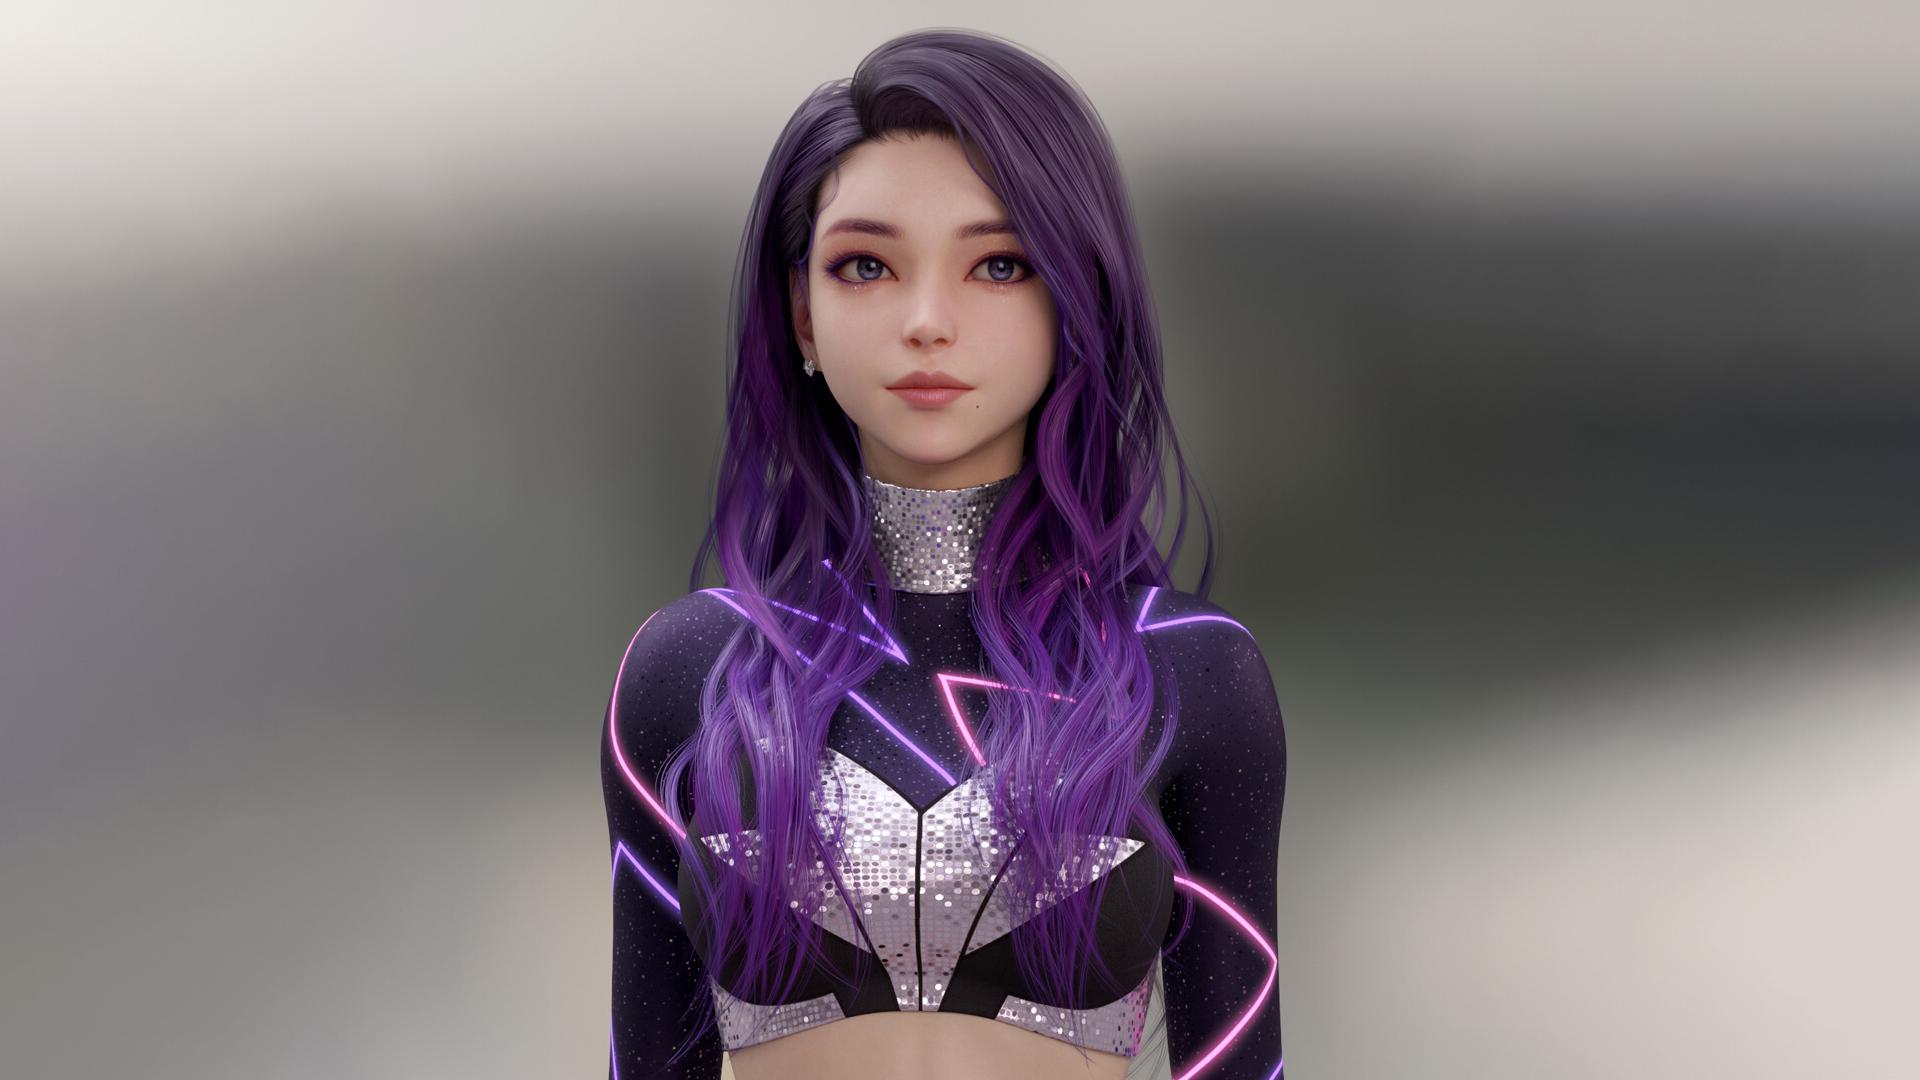 General 1920x1080 Shin JeongHo CGI women purple hair long hair purple eyes earring neon glow blouse glitter purple clothing simple background